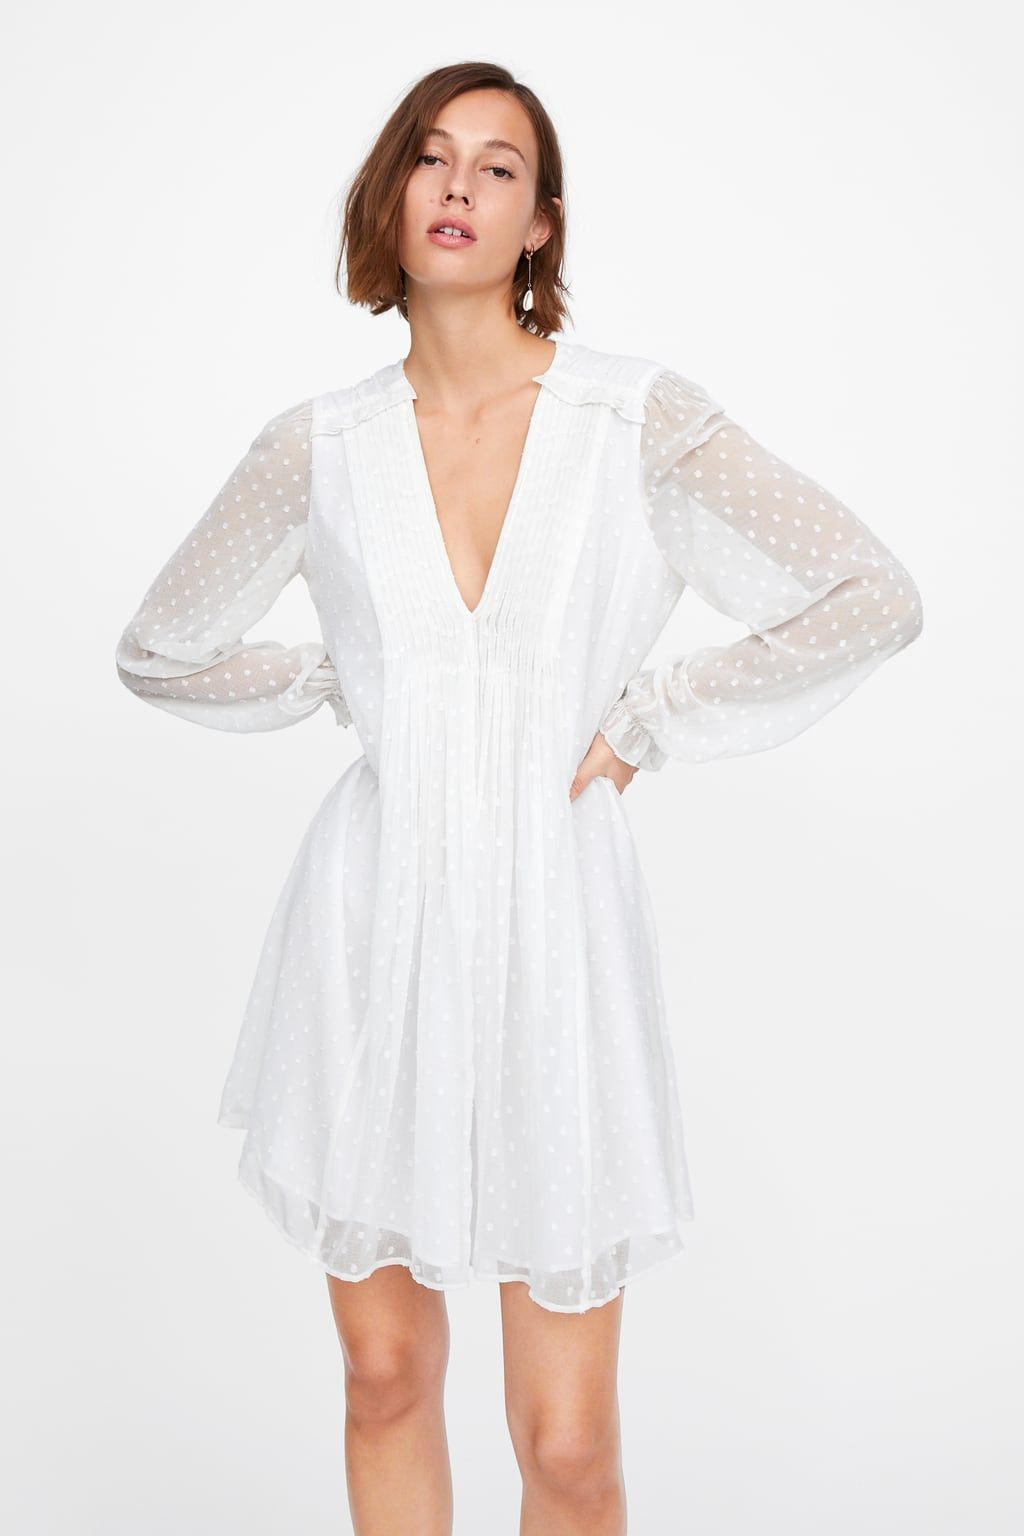 descuento calidad perfecta apariencia elegante Vestido mini plumeti | Style inspo en 2019 | Vestidos, Mini ...